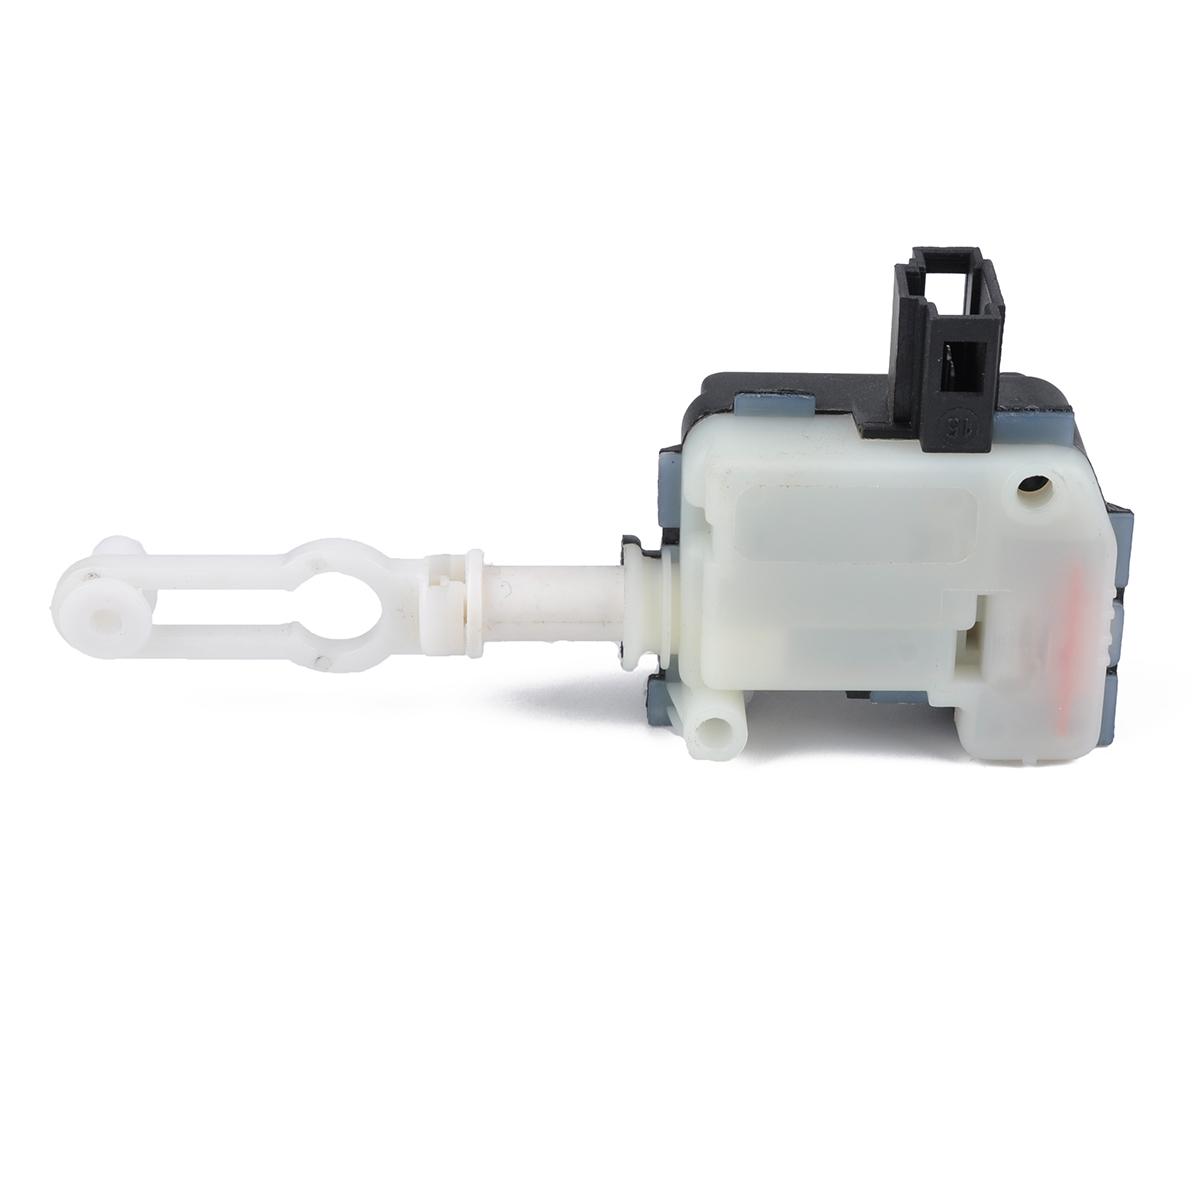 Bernard Bertha Trunk Lock Release Actuator Motor OEM 8E5962115B fit for Audi A2 2000-2005